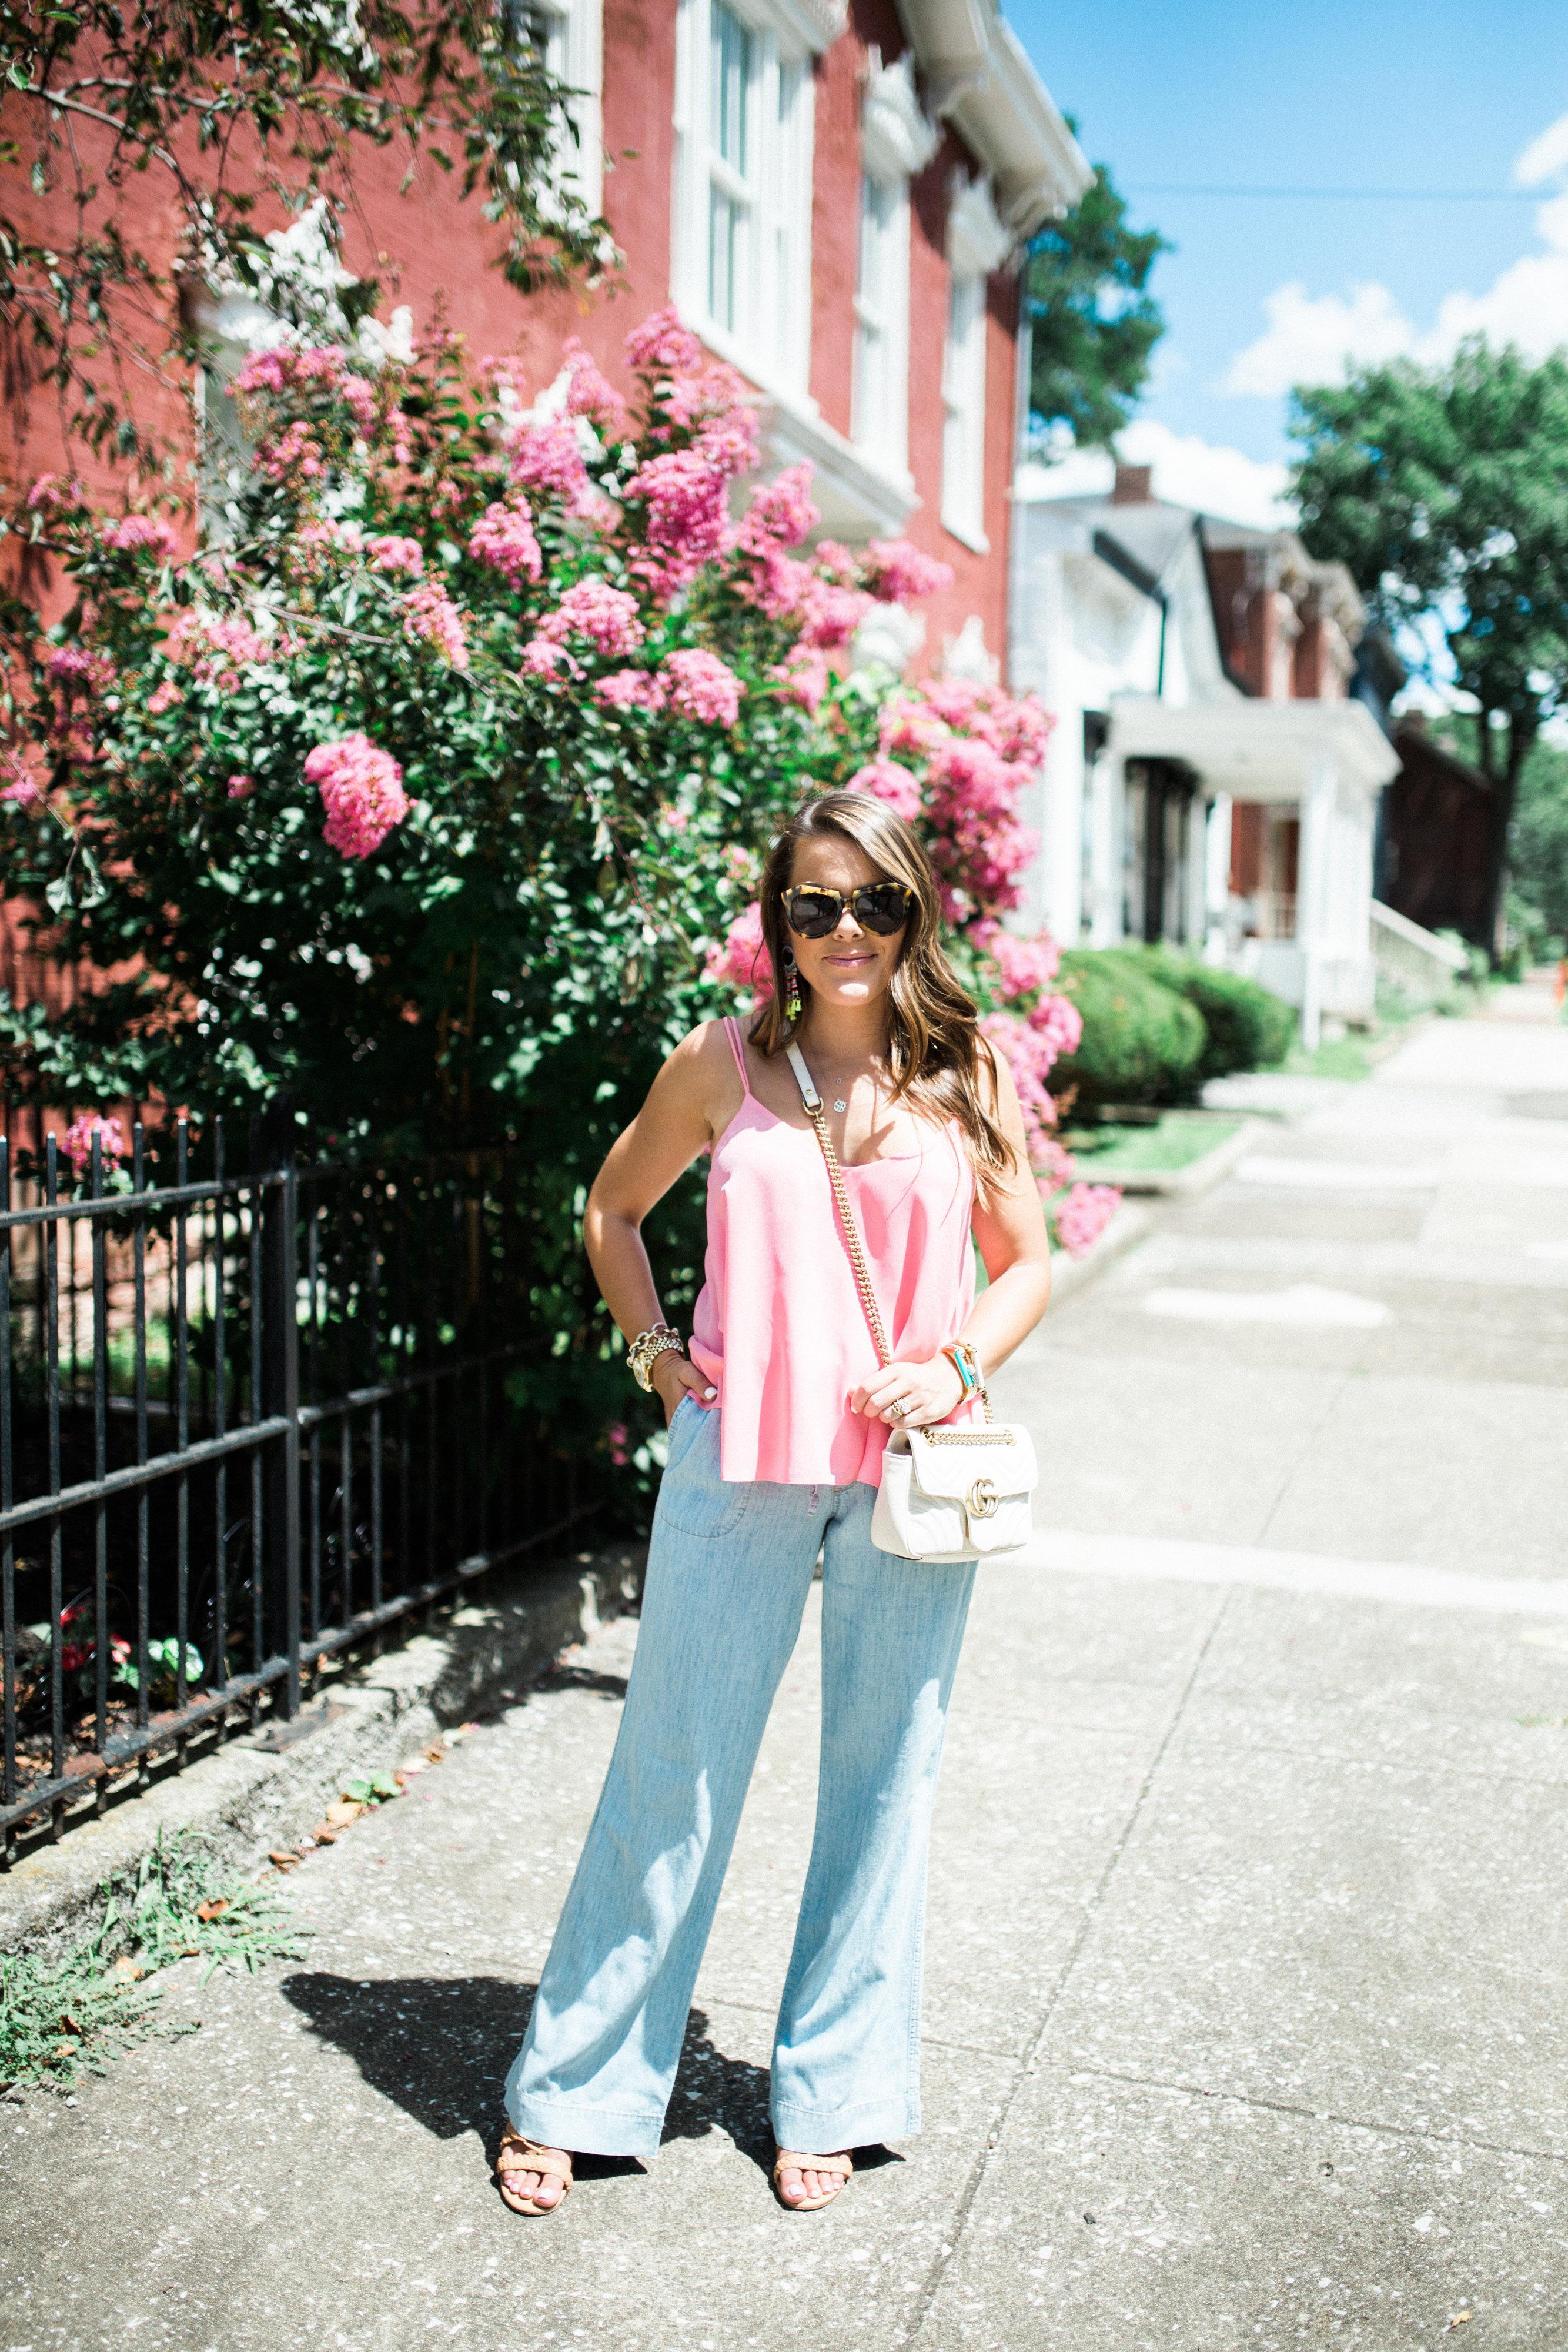 Chambray Pants via Glitter & Gingham / Topshop Tank / BaubleBar Earrings, Gucci Mini Marmont / Summer Style Inspiration